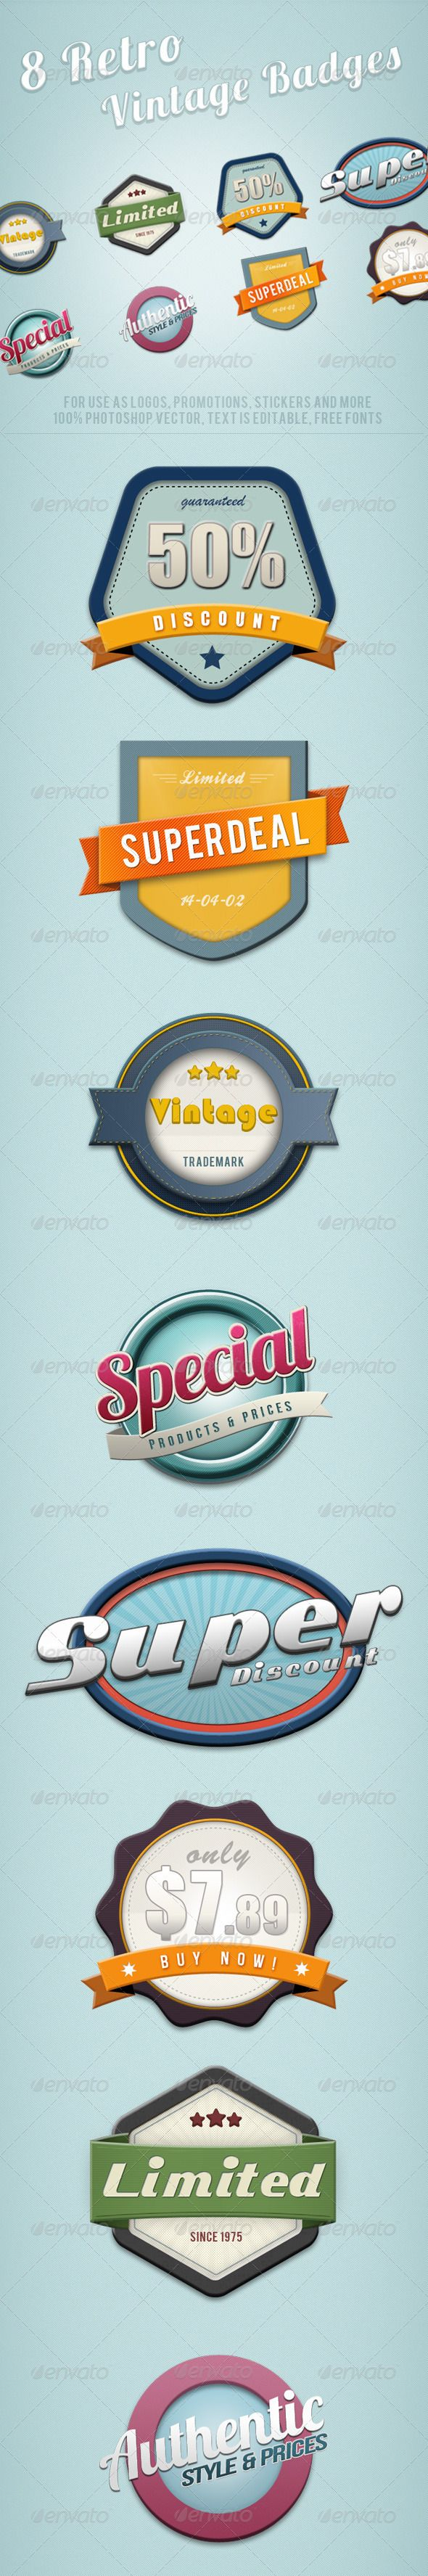 GraphicRiver 8 Retro Vintage Badges 2204846